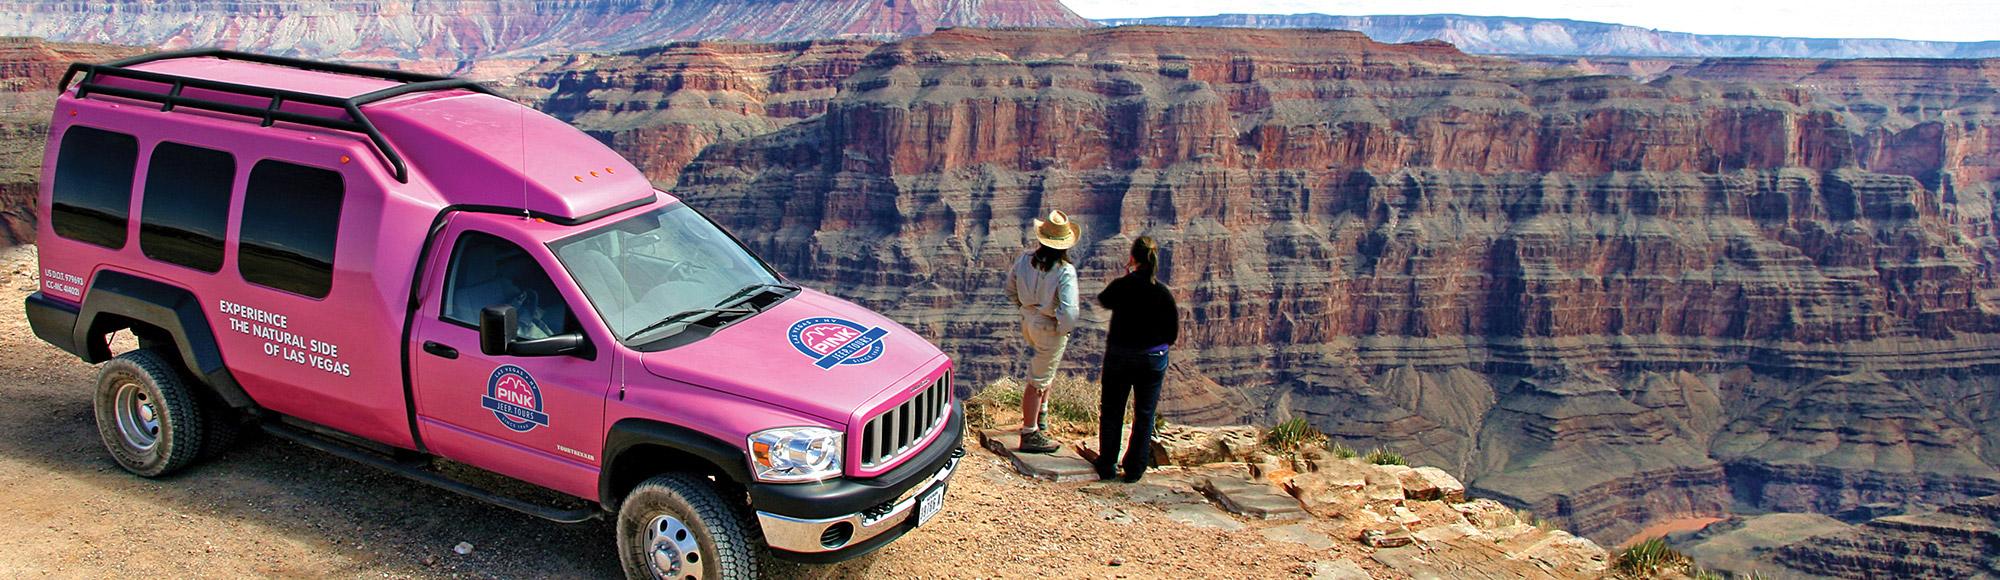 Grand Canyon West Rim Classic tour